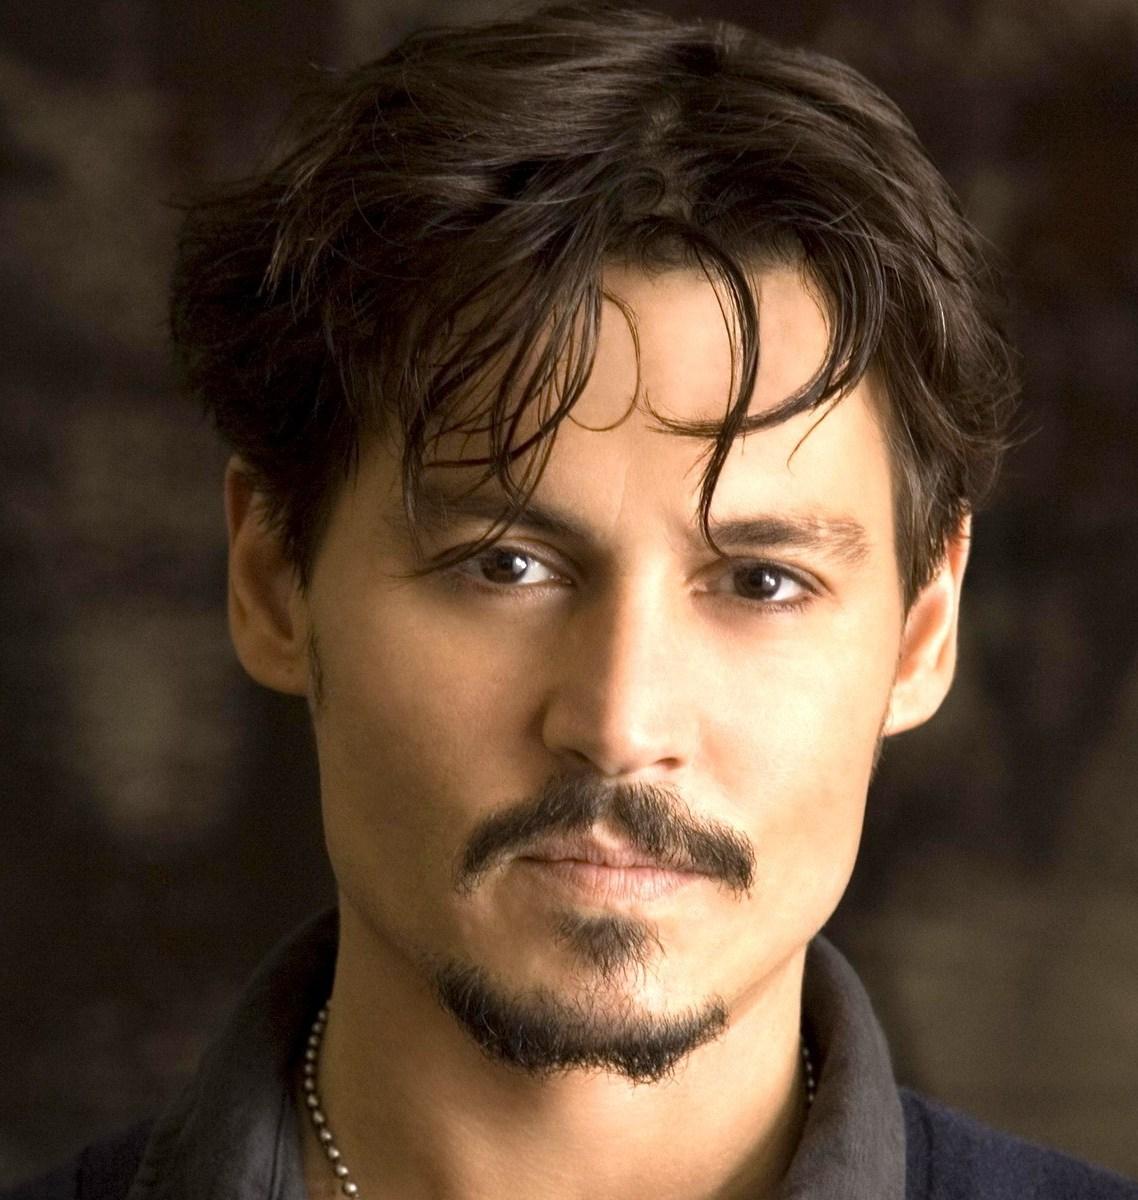 Foto Johnny Depp oleh segiempat